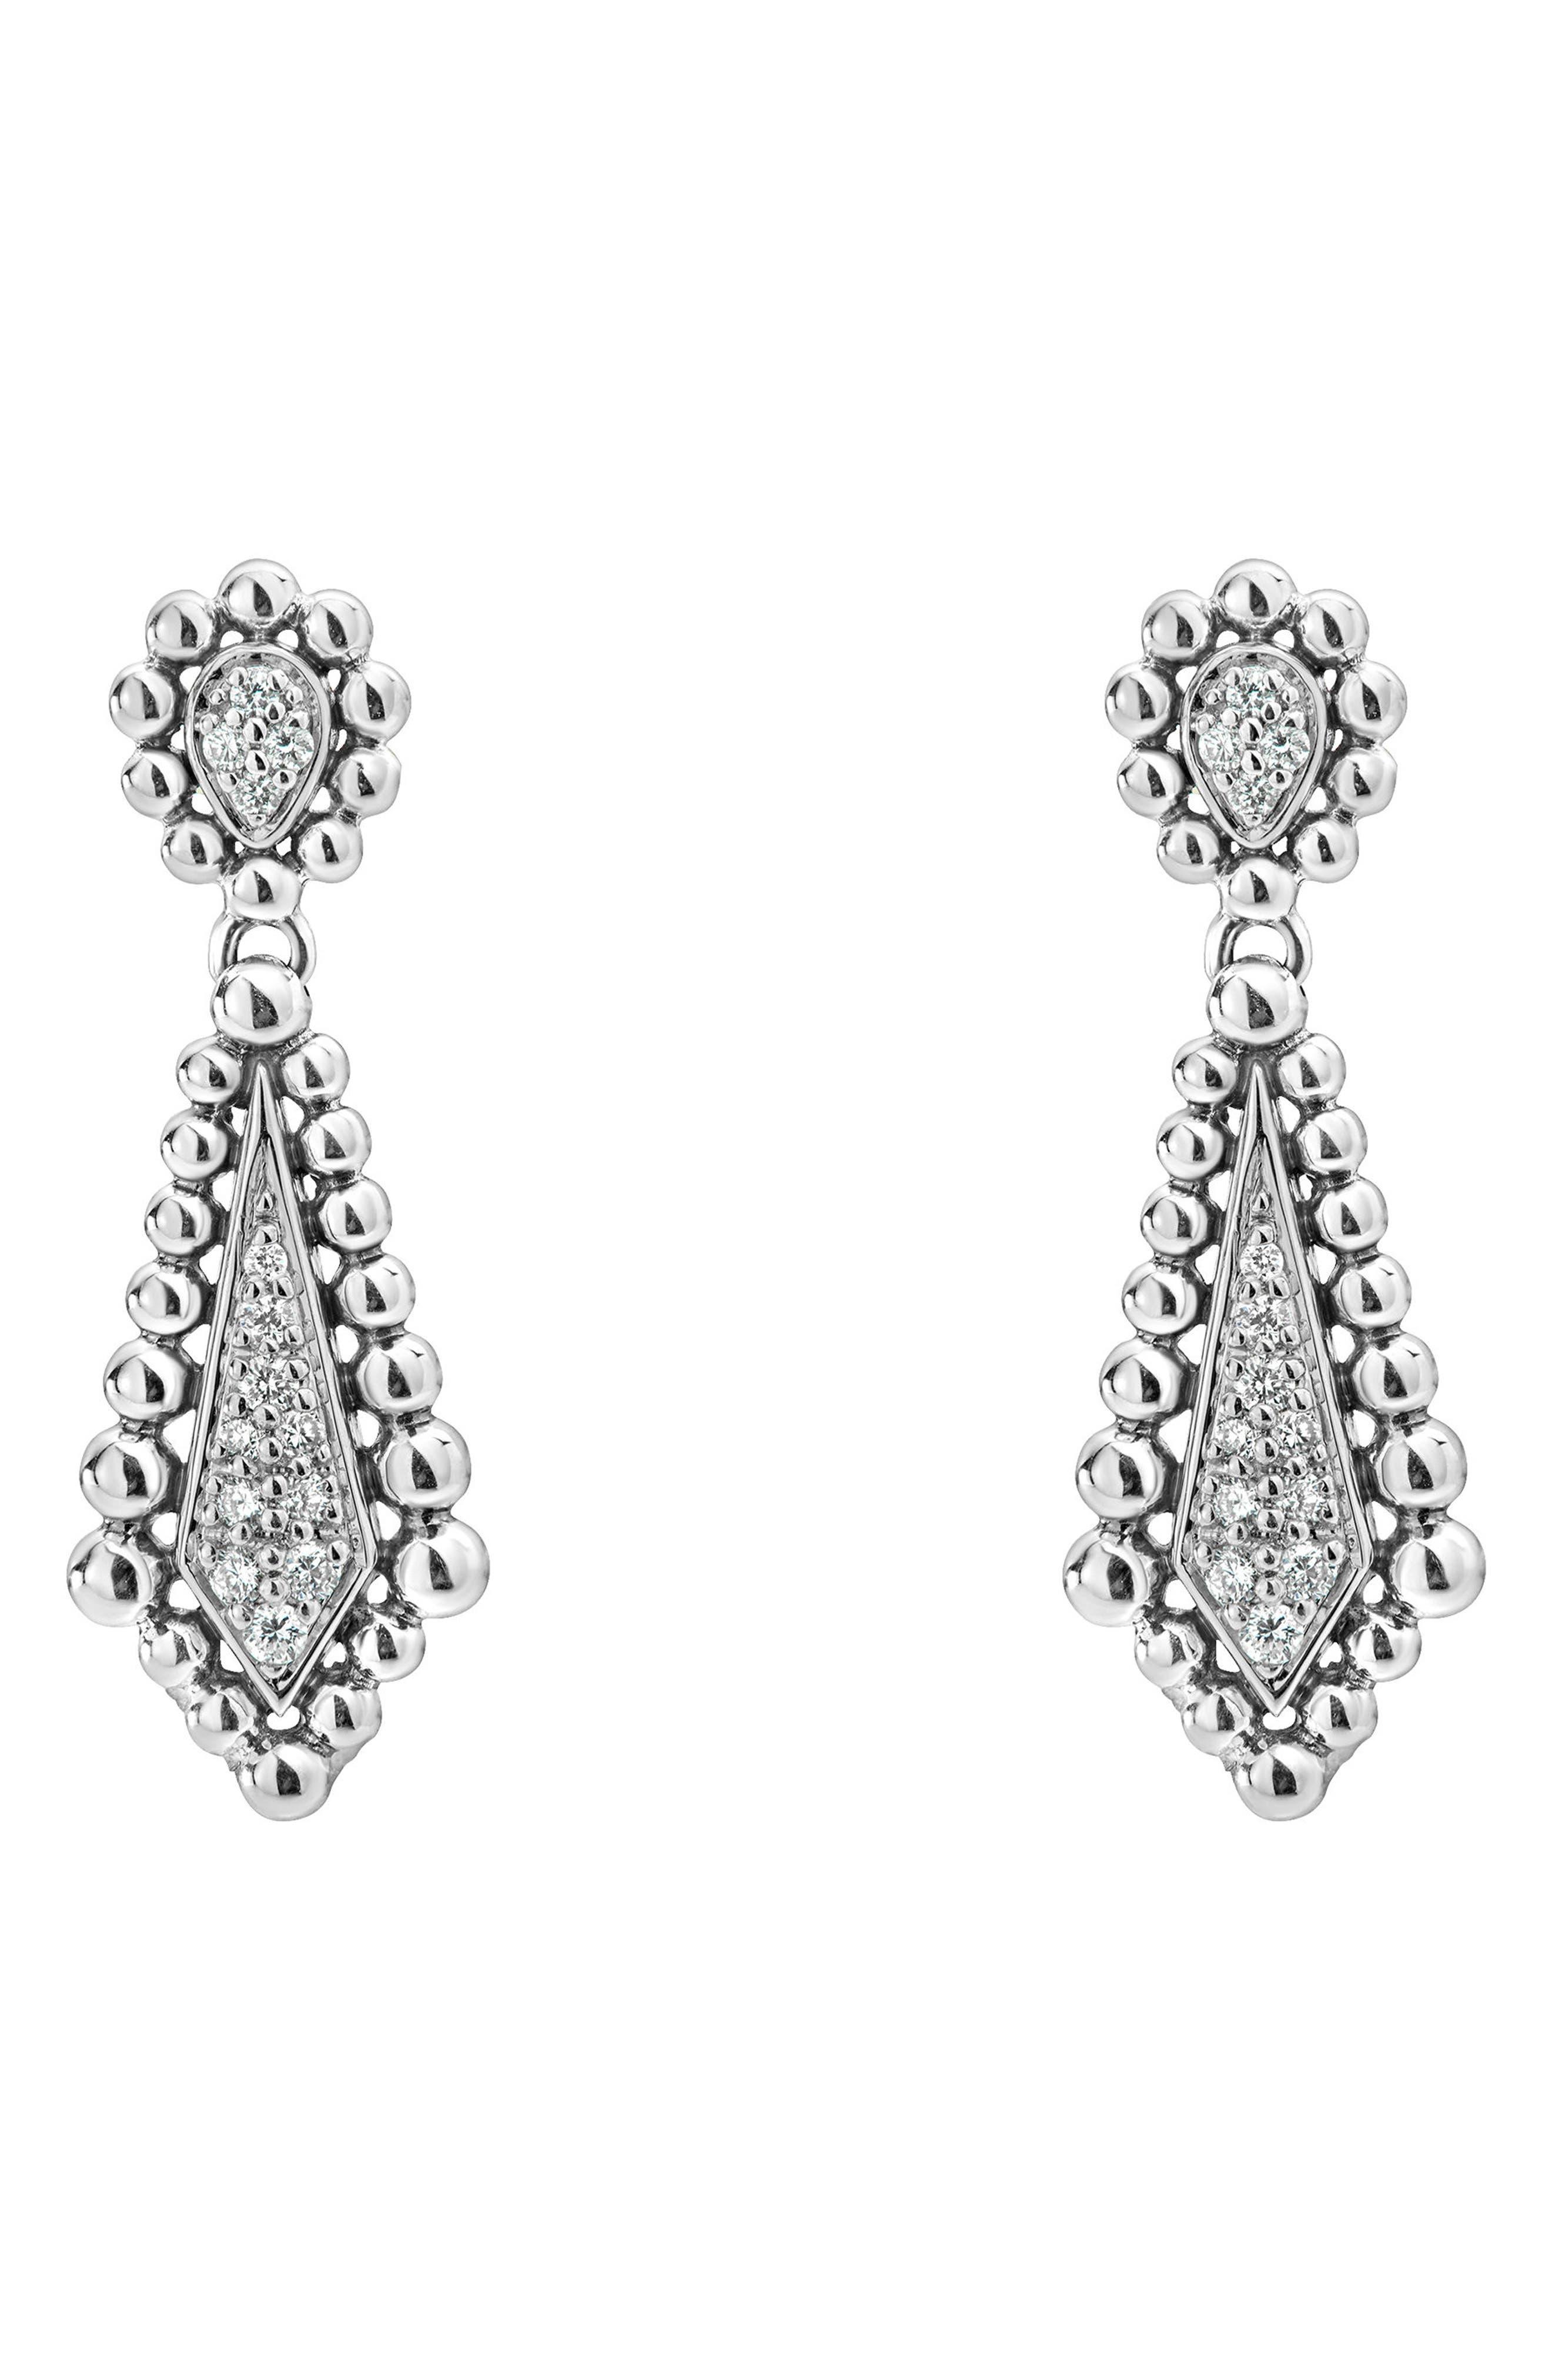 Caviar Spark Diamond Earrings,                         Main,                         color, Diamond